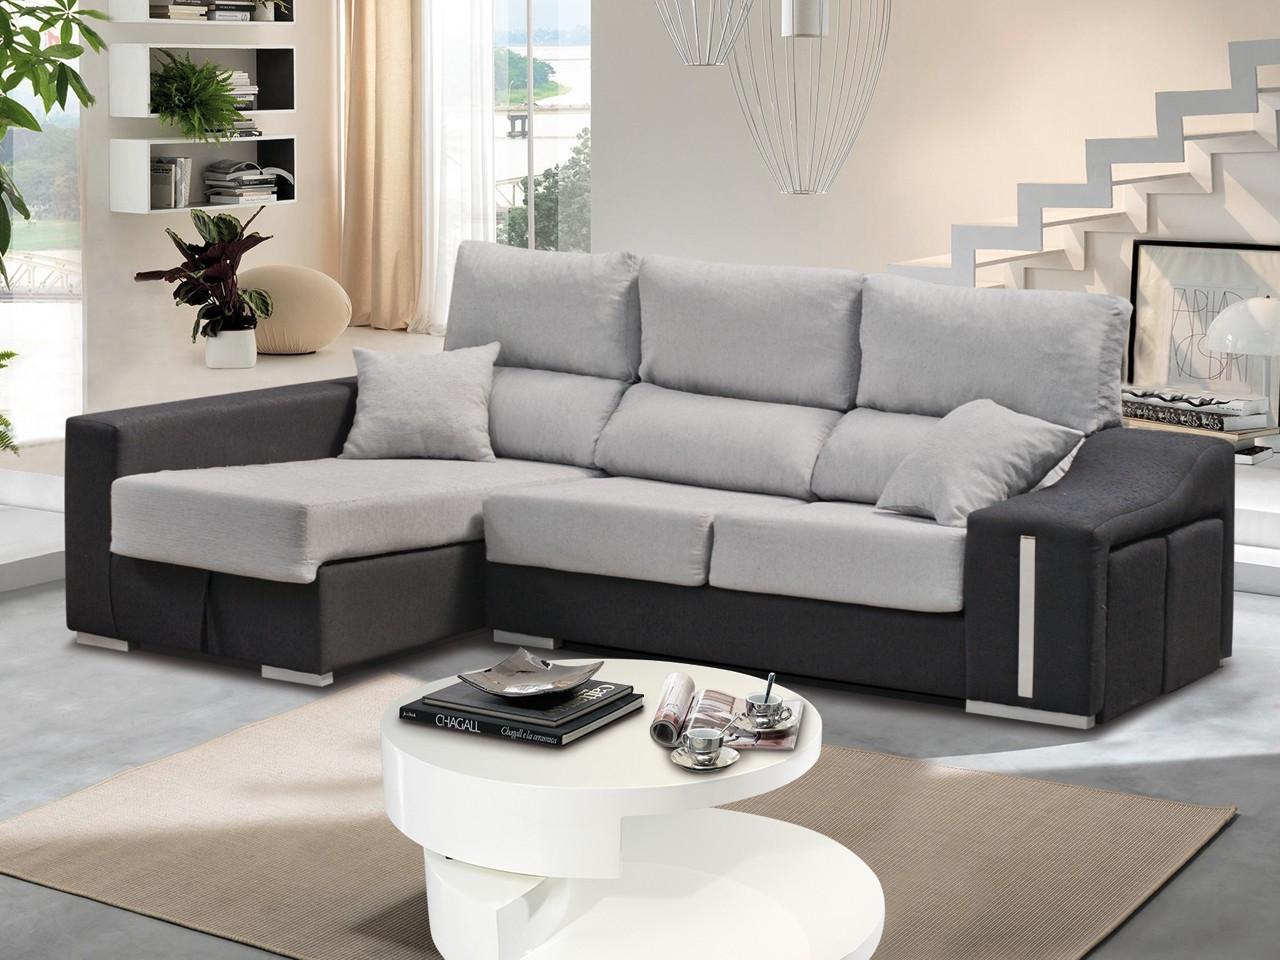 Dicoro sofas Irdz Carino sofas Cheslong Baratos Chaise Longue Dicoro sofa Boss Tela